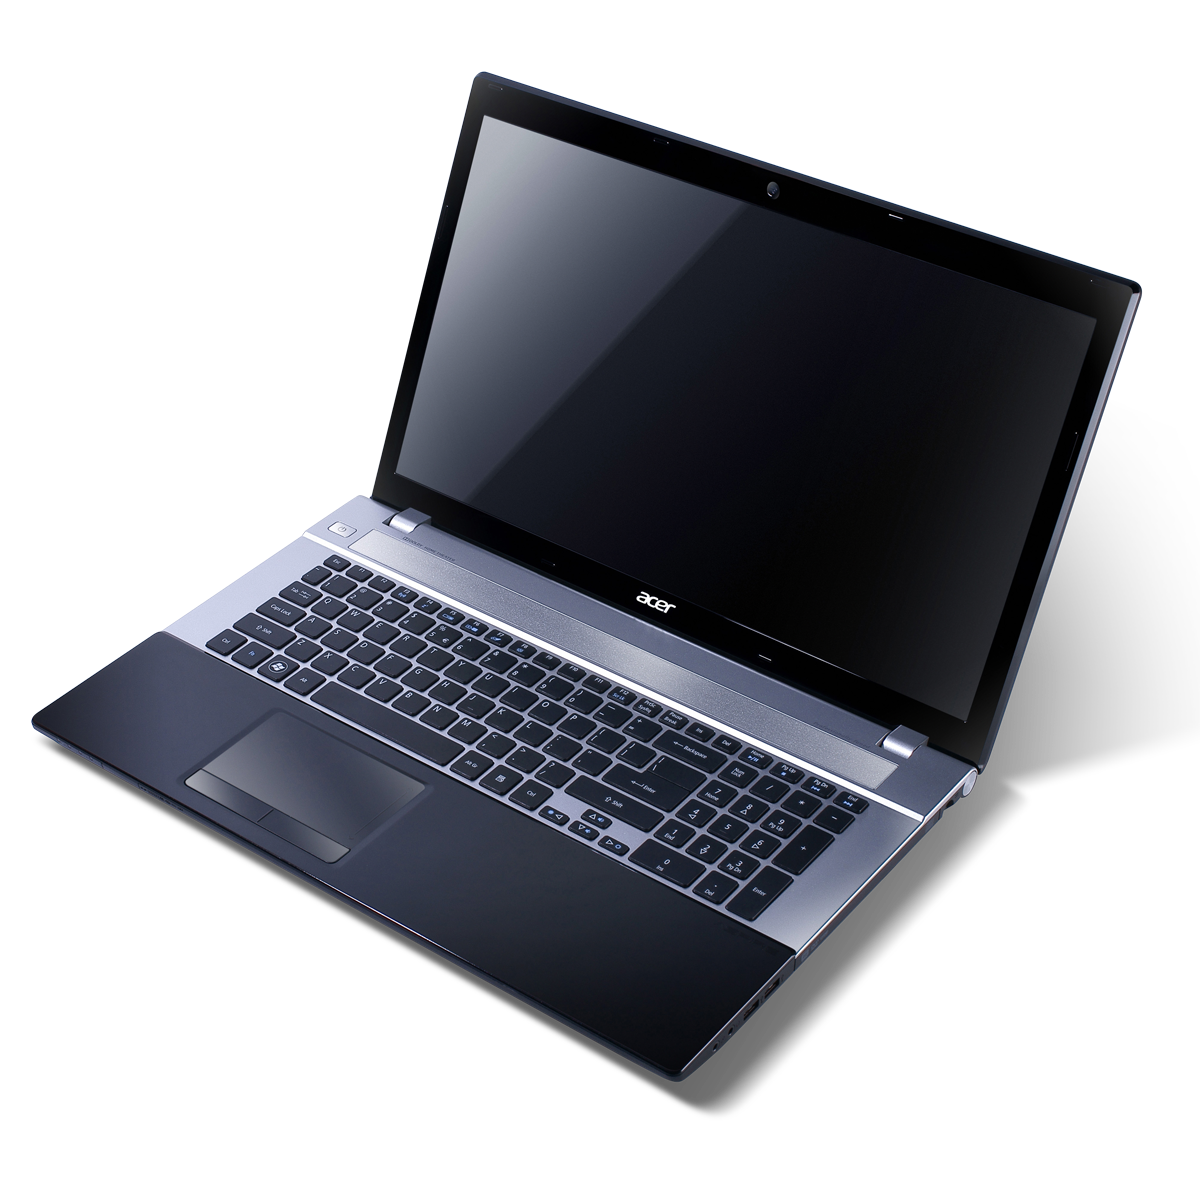 need help picking a laptop. Black Bedroom Furniture Sets. Home Design Ideas